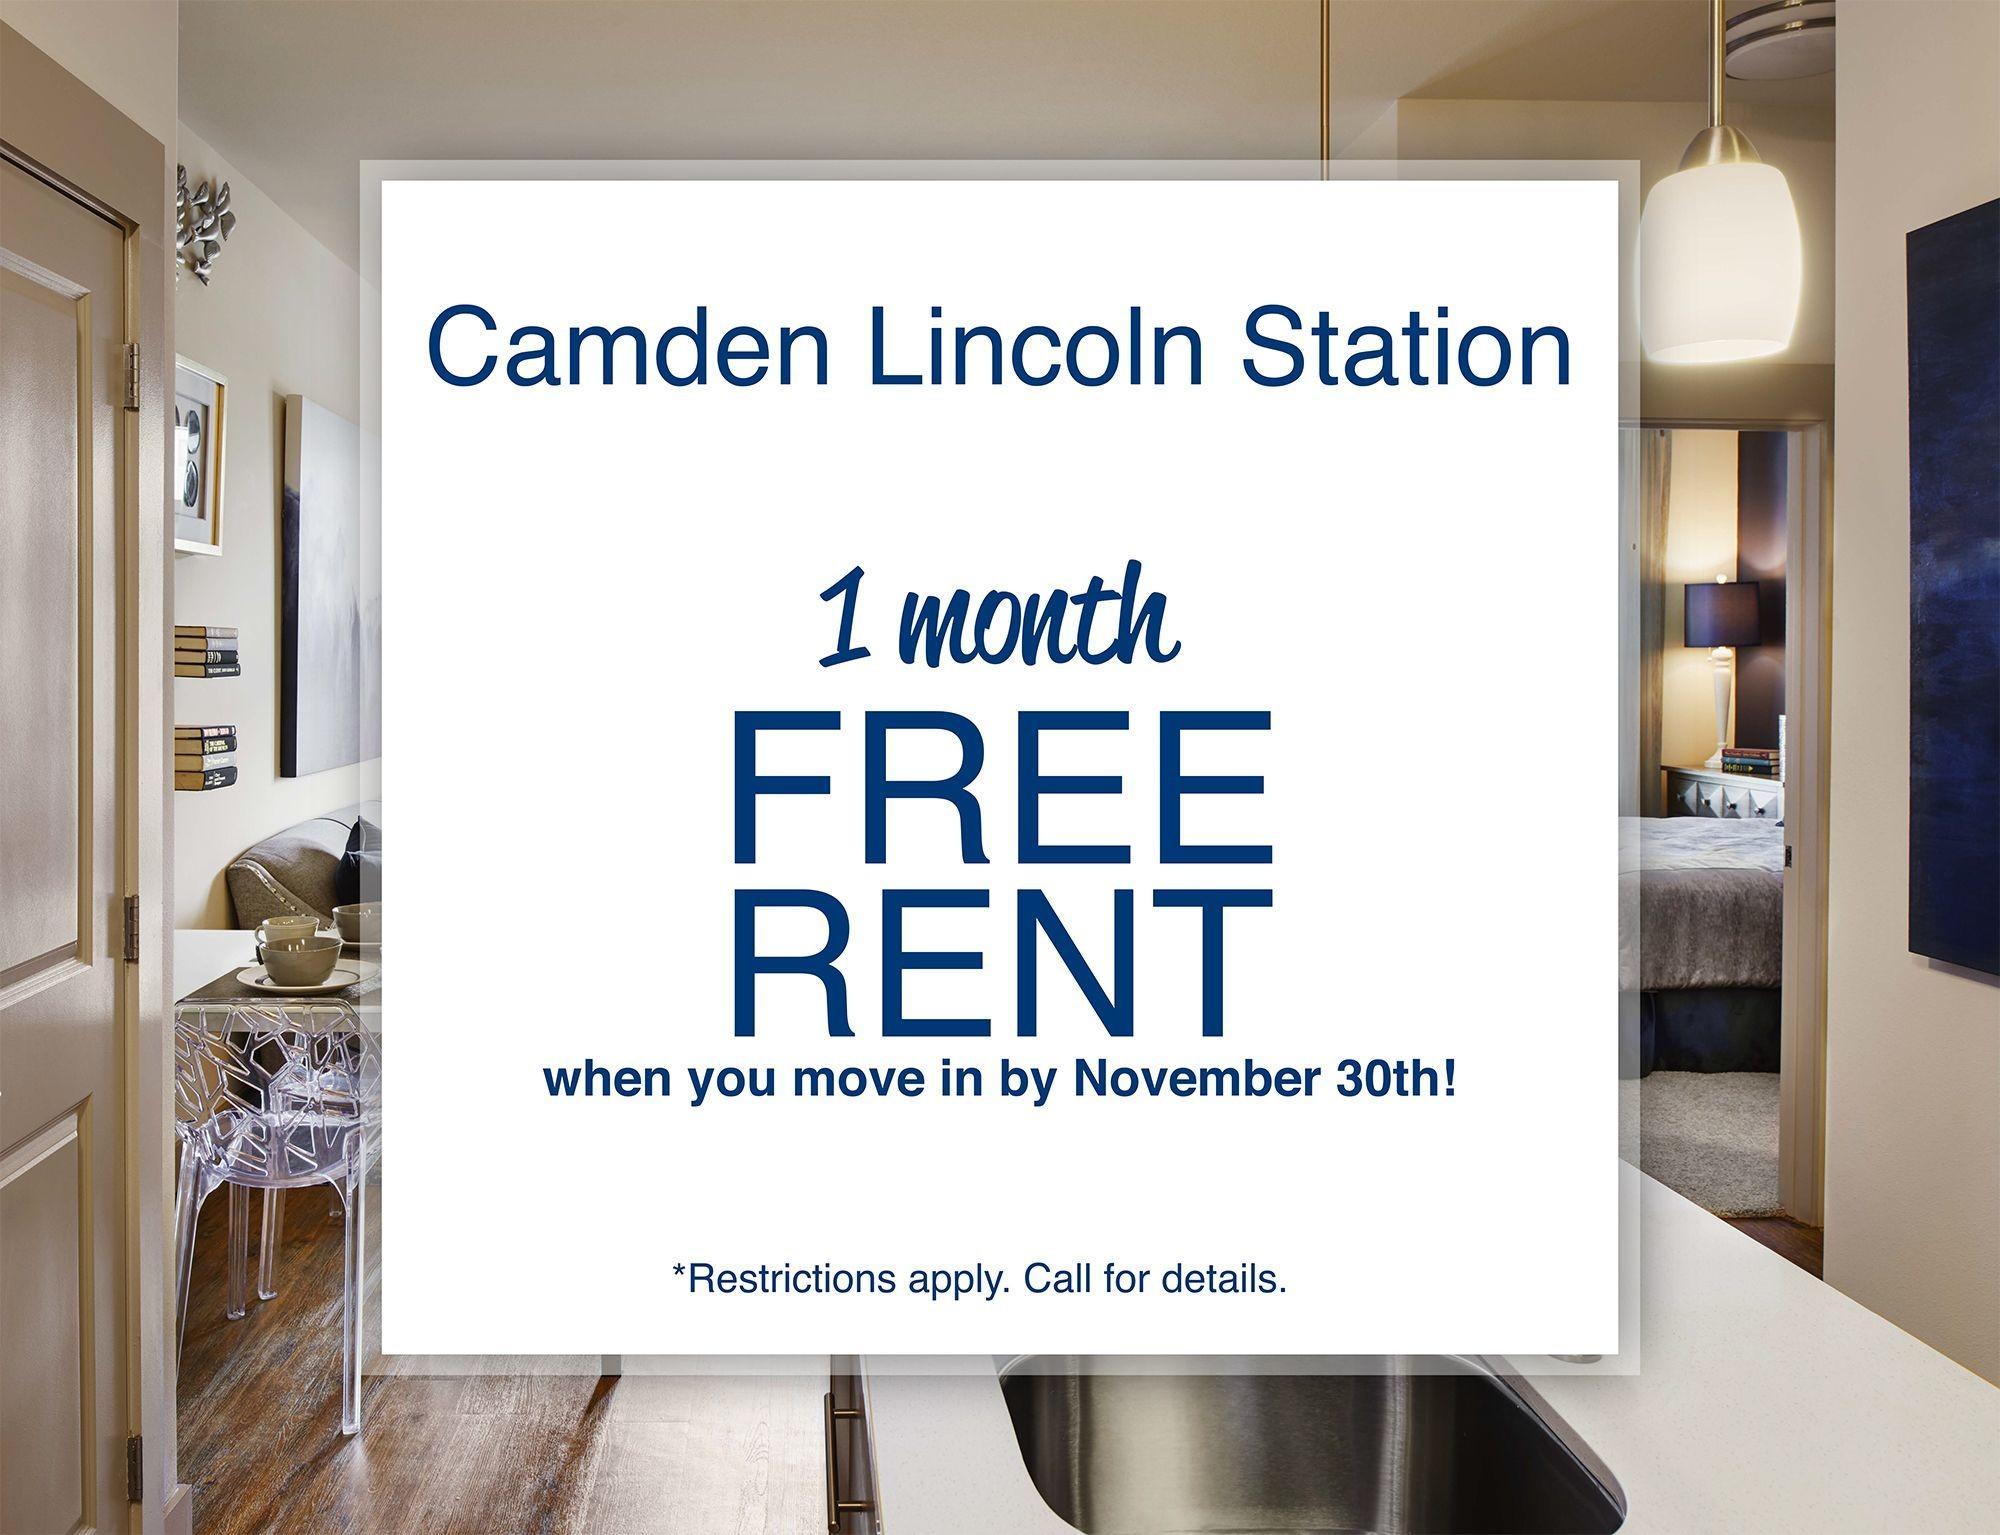 Camden Lincoln Station